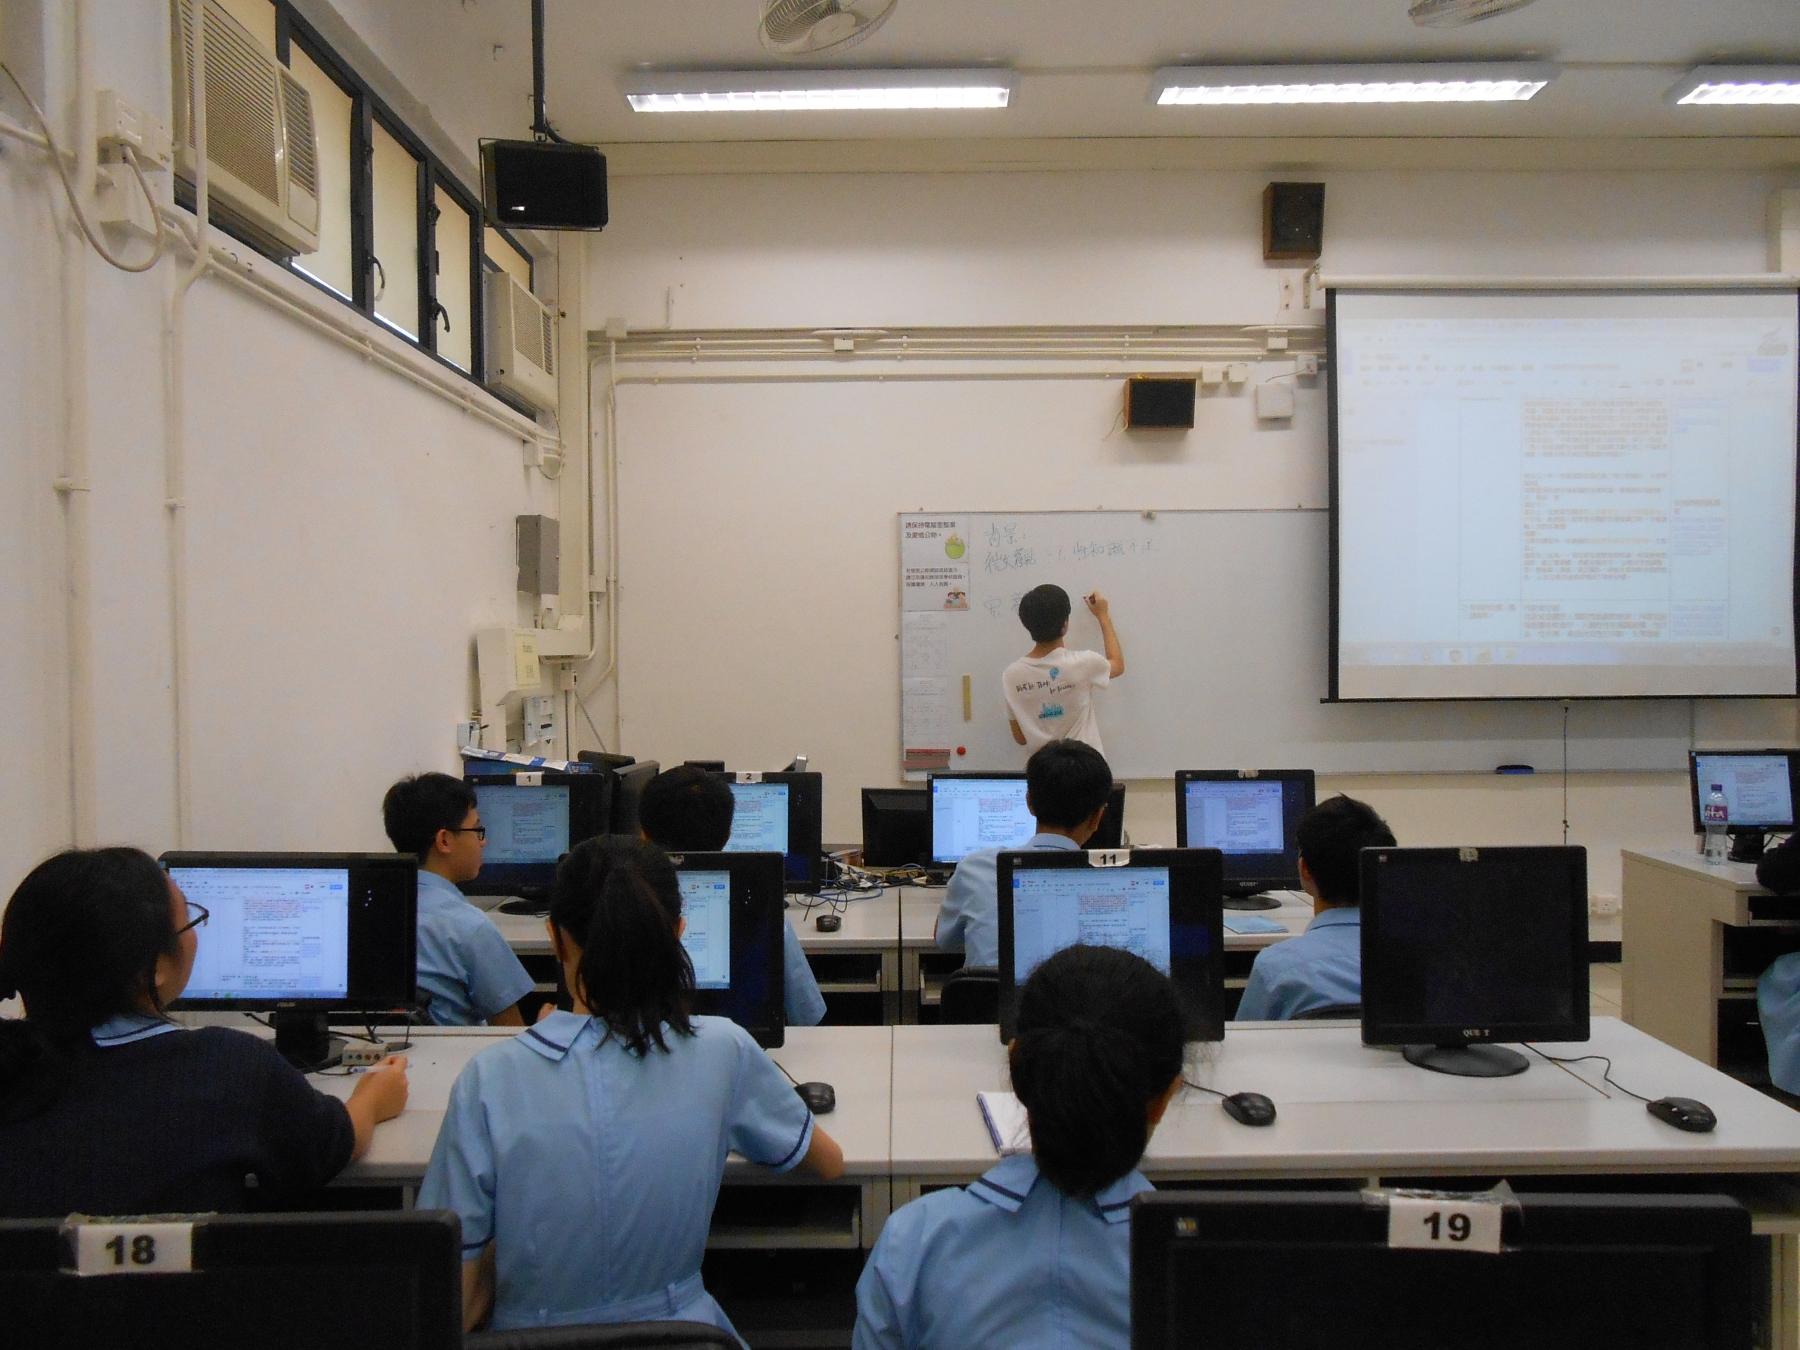 http://www.npc.edu.hk/sites/default/files/dscn0919.jpg